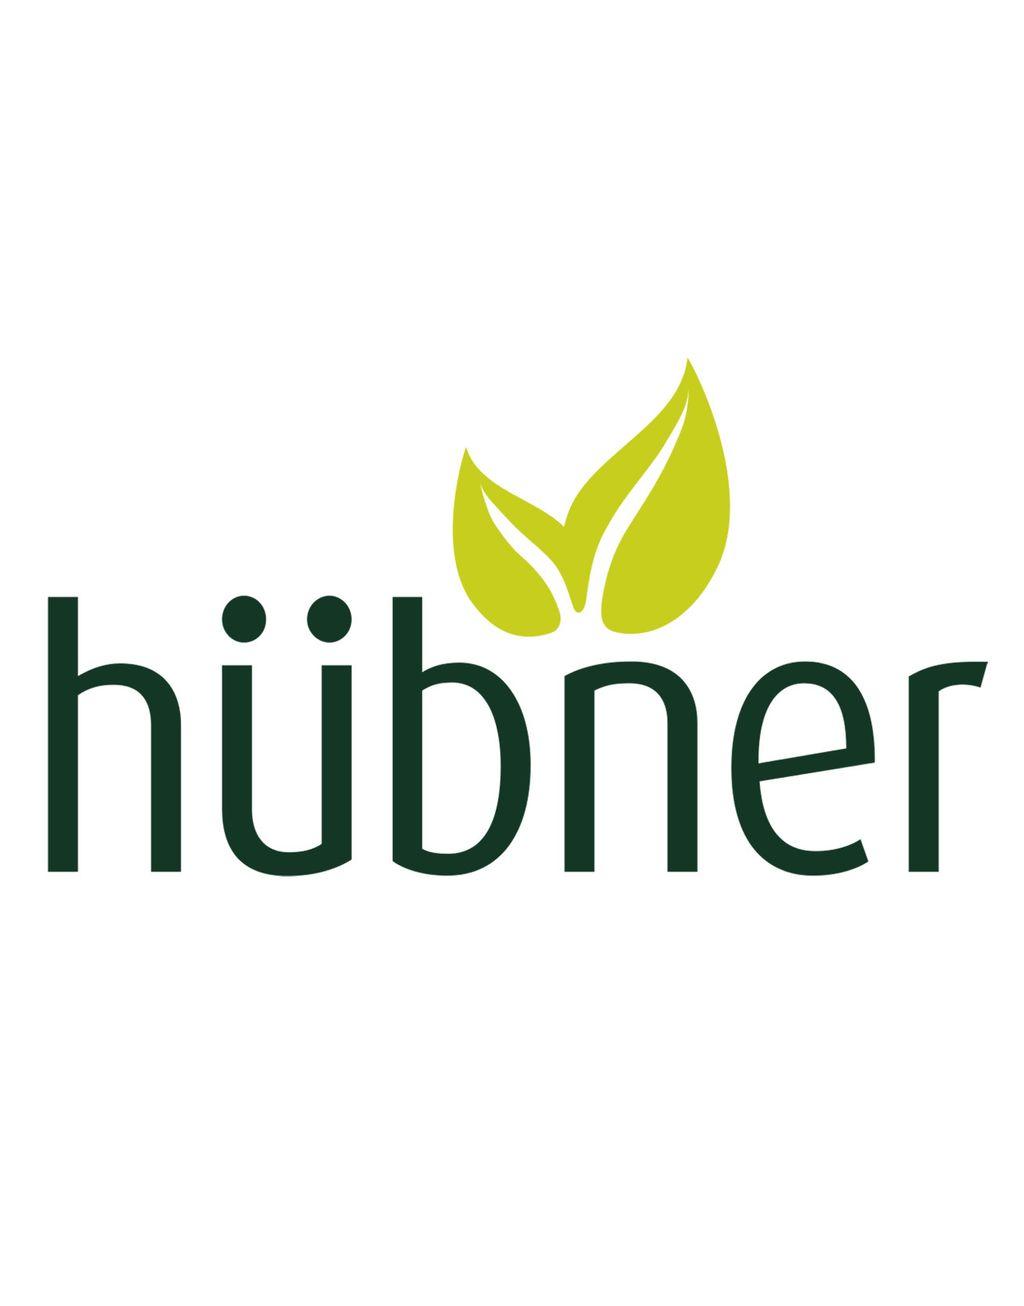 huebner_logo.jpg